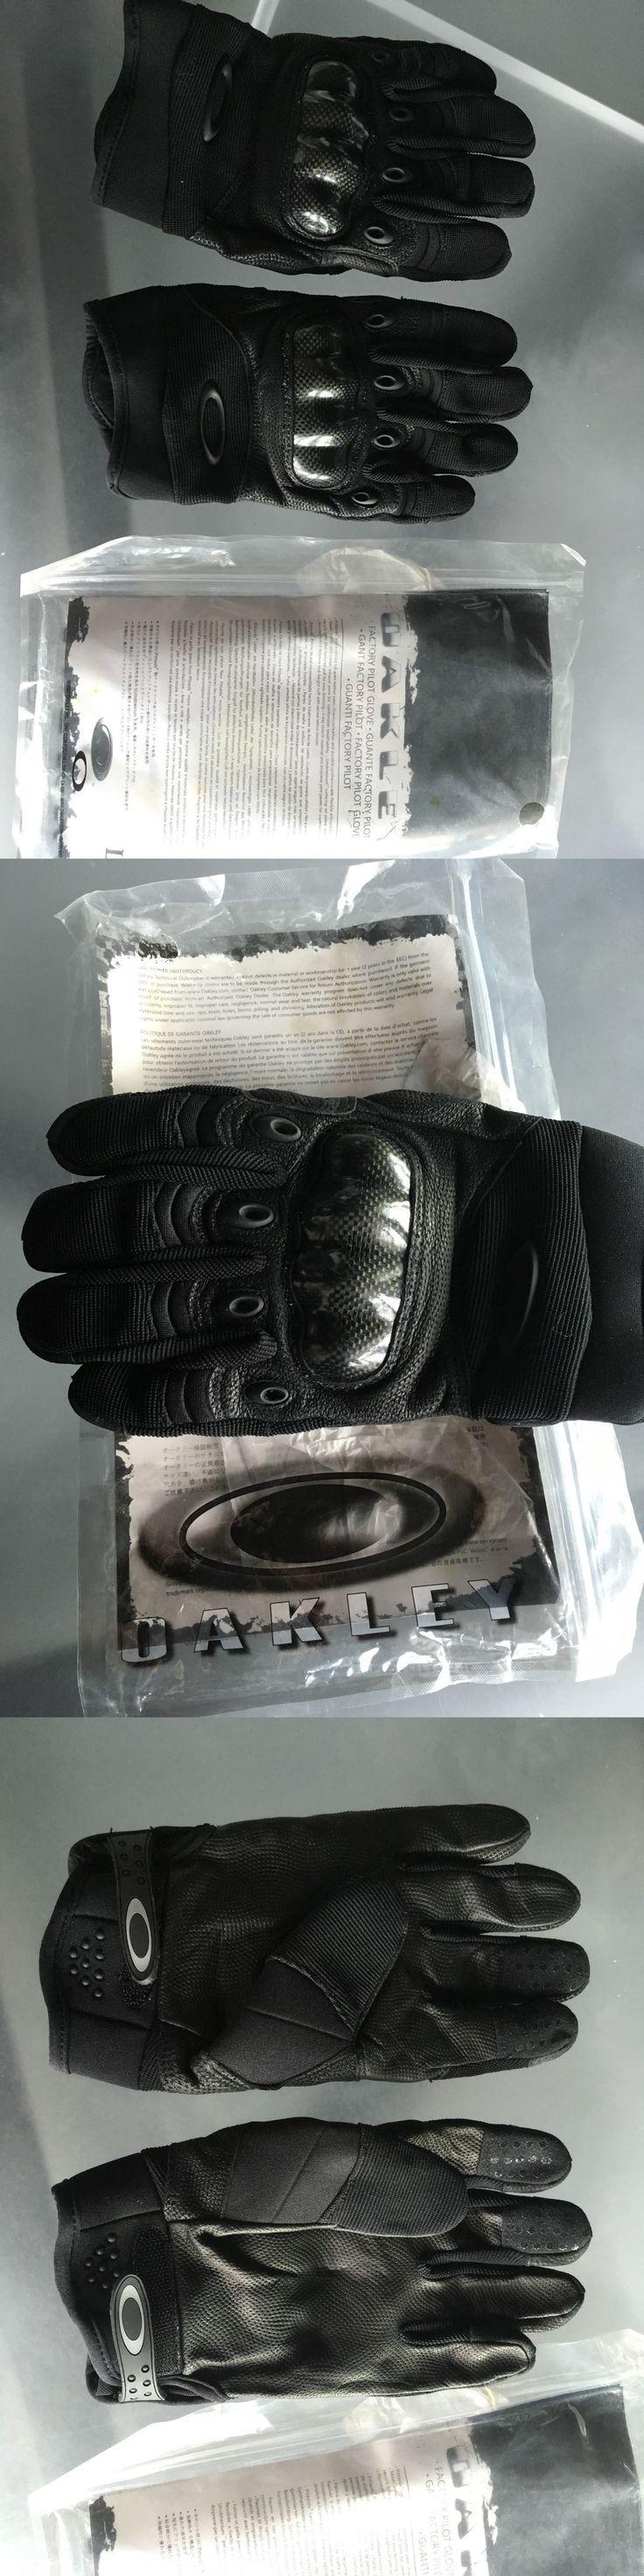 oakley tactical gloves review hckc  Tactical Gloves 177898: New Oakley Factory Pilot Tactical Gloves Black  Large L Carbon Fiber